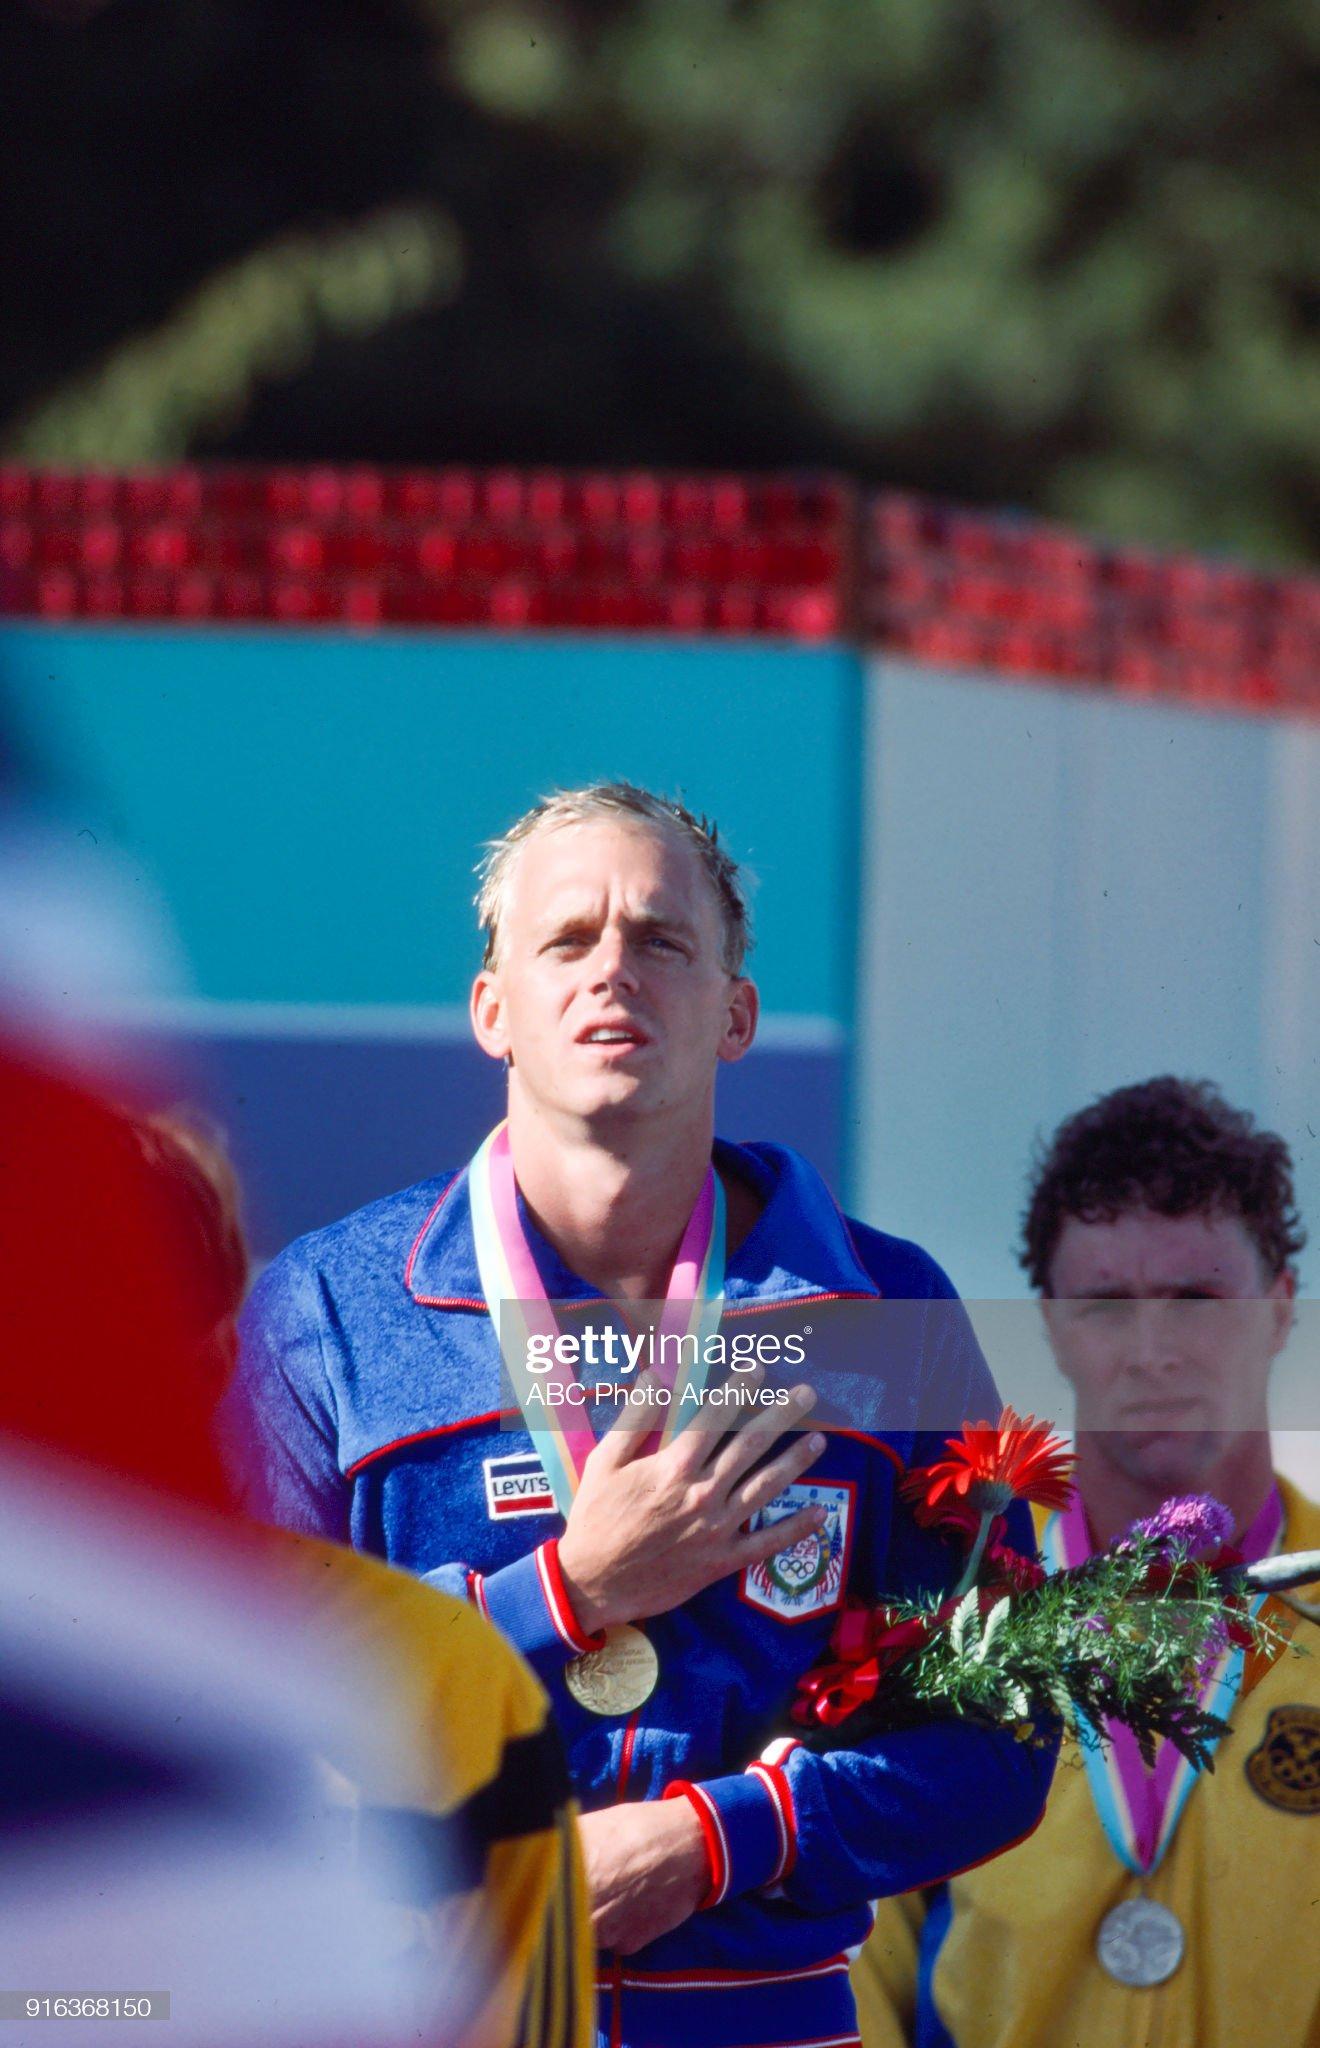 Men's Swimming 100 Metre Freestyle Medal Ceremony At The 1984 Summer Olympics : Fotografía de noticias